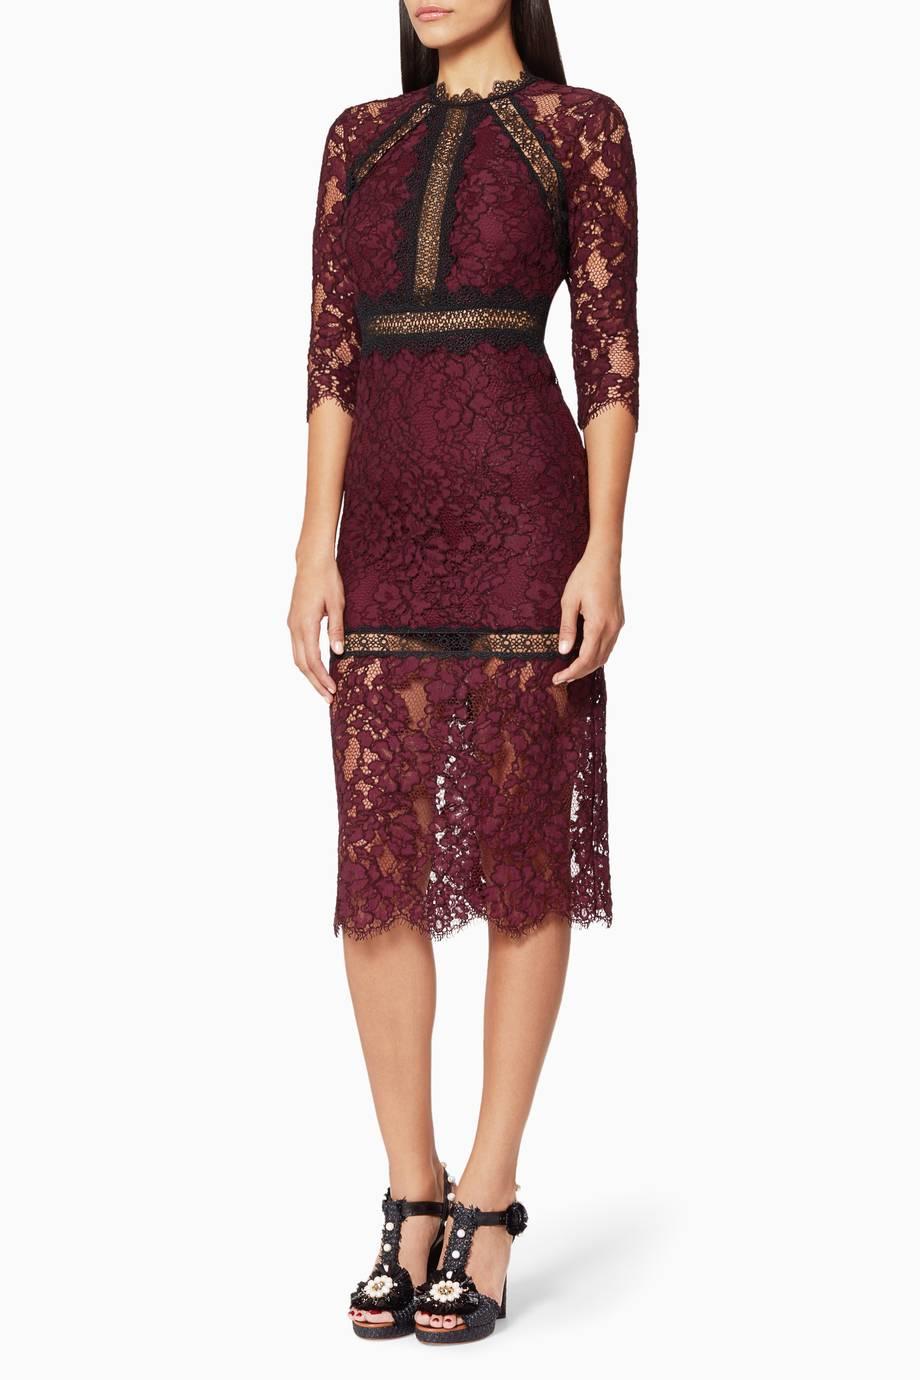 Shop Luxury Alexis Burgandy Marissa Lace Dress | Ounass UAE